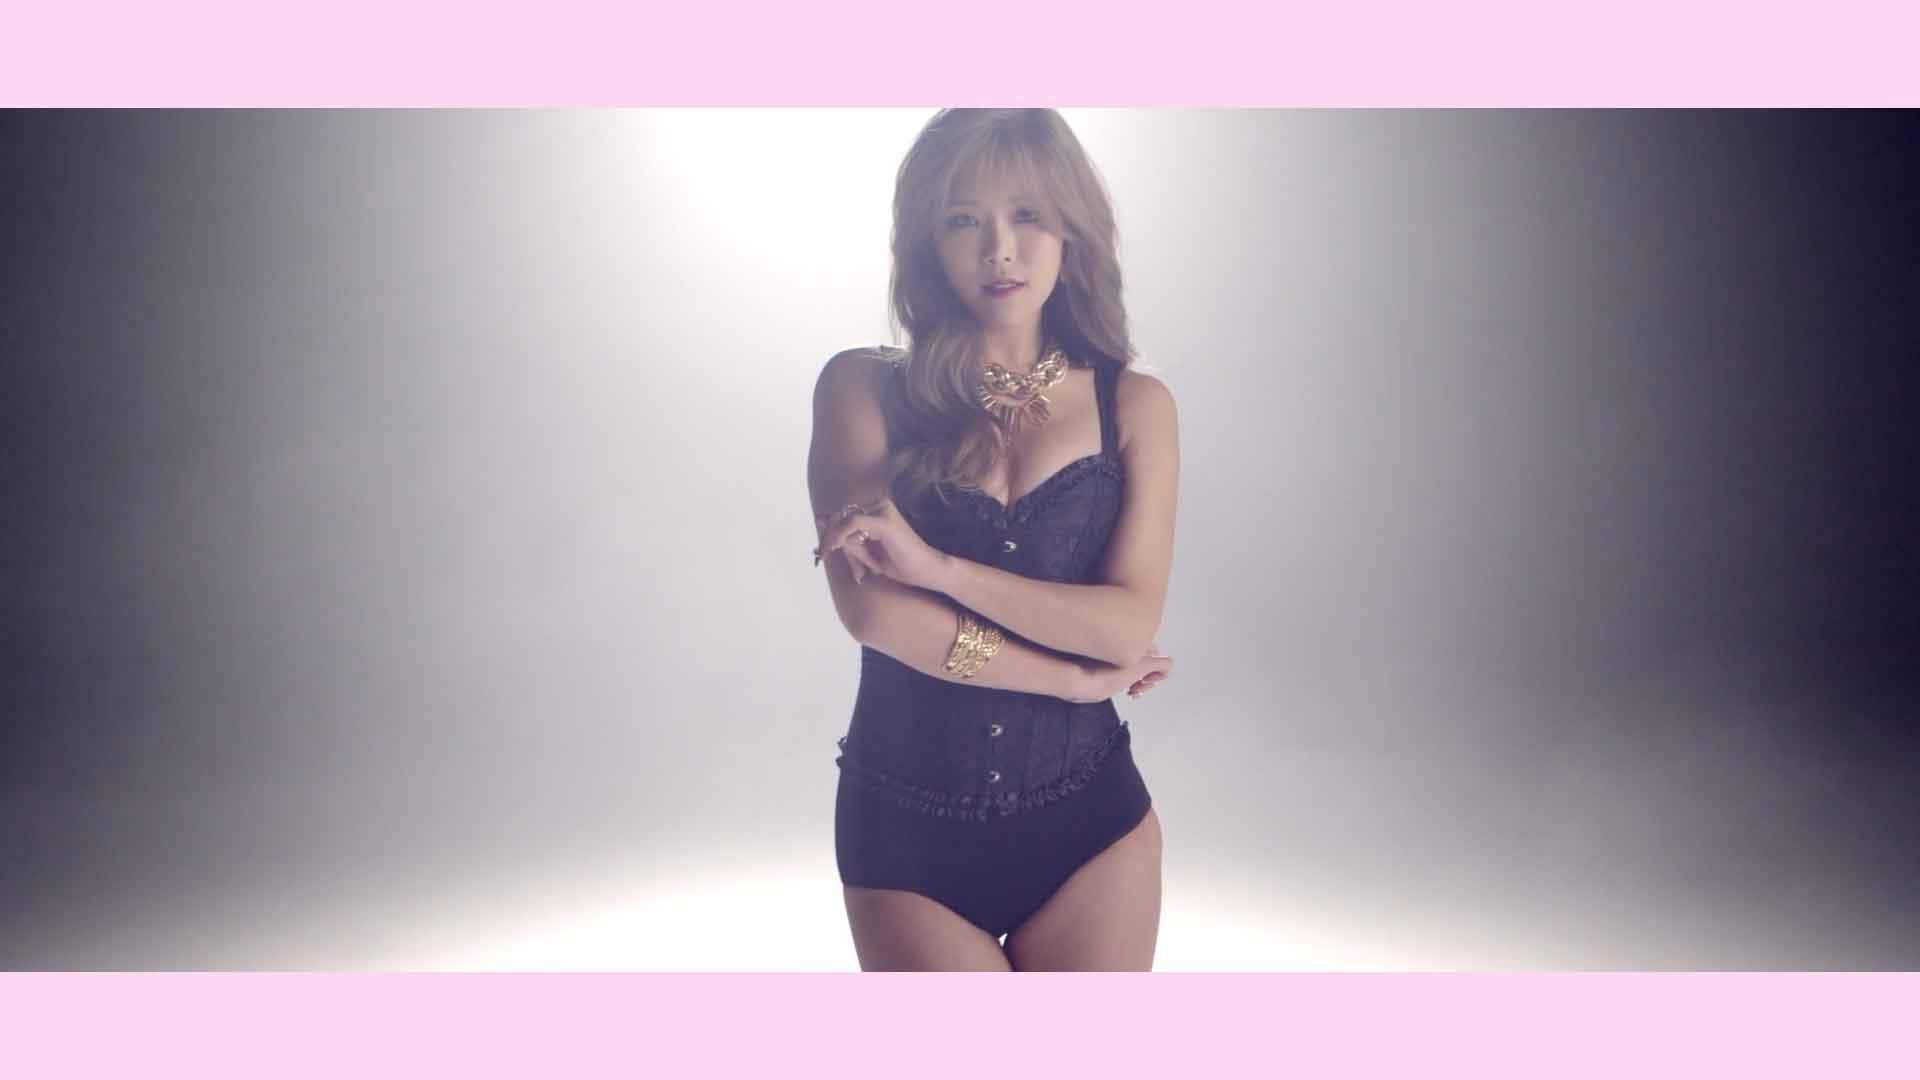 [1080P] Dia Girls - Gently (Melon - 246m)